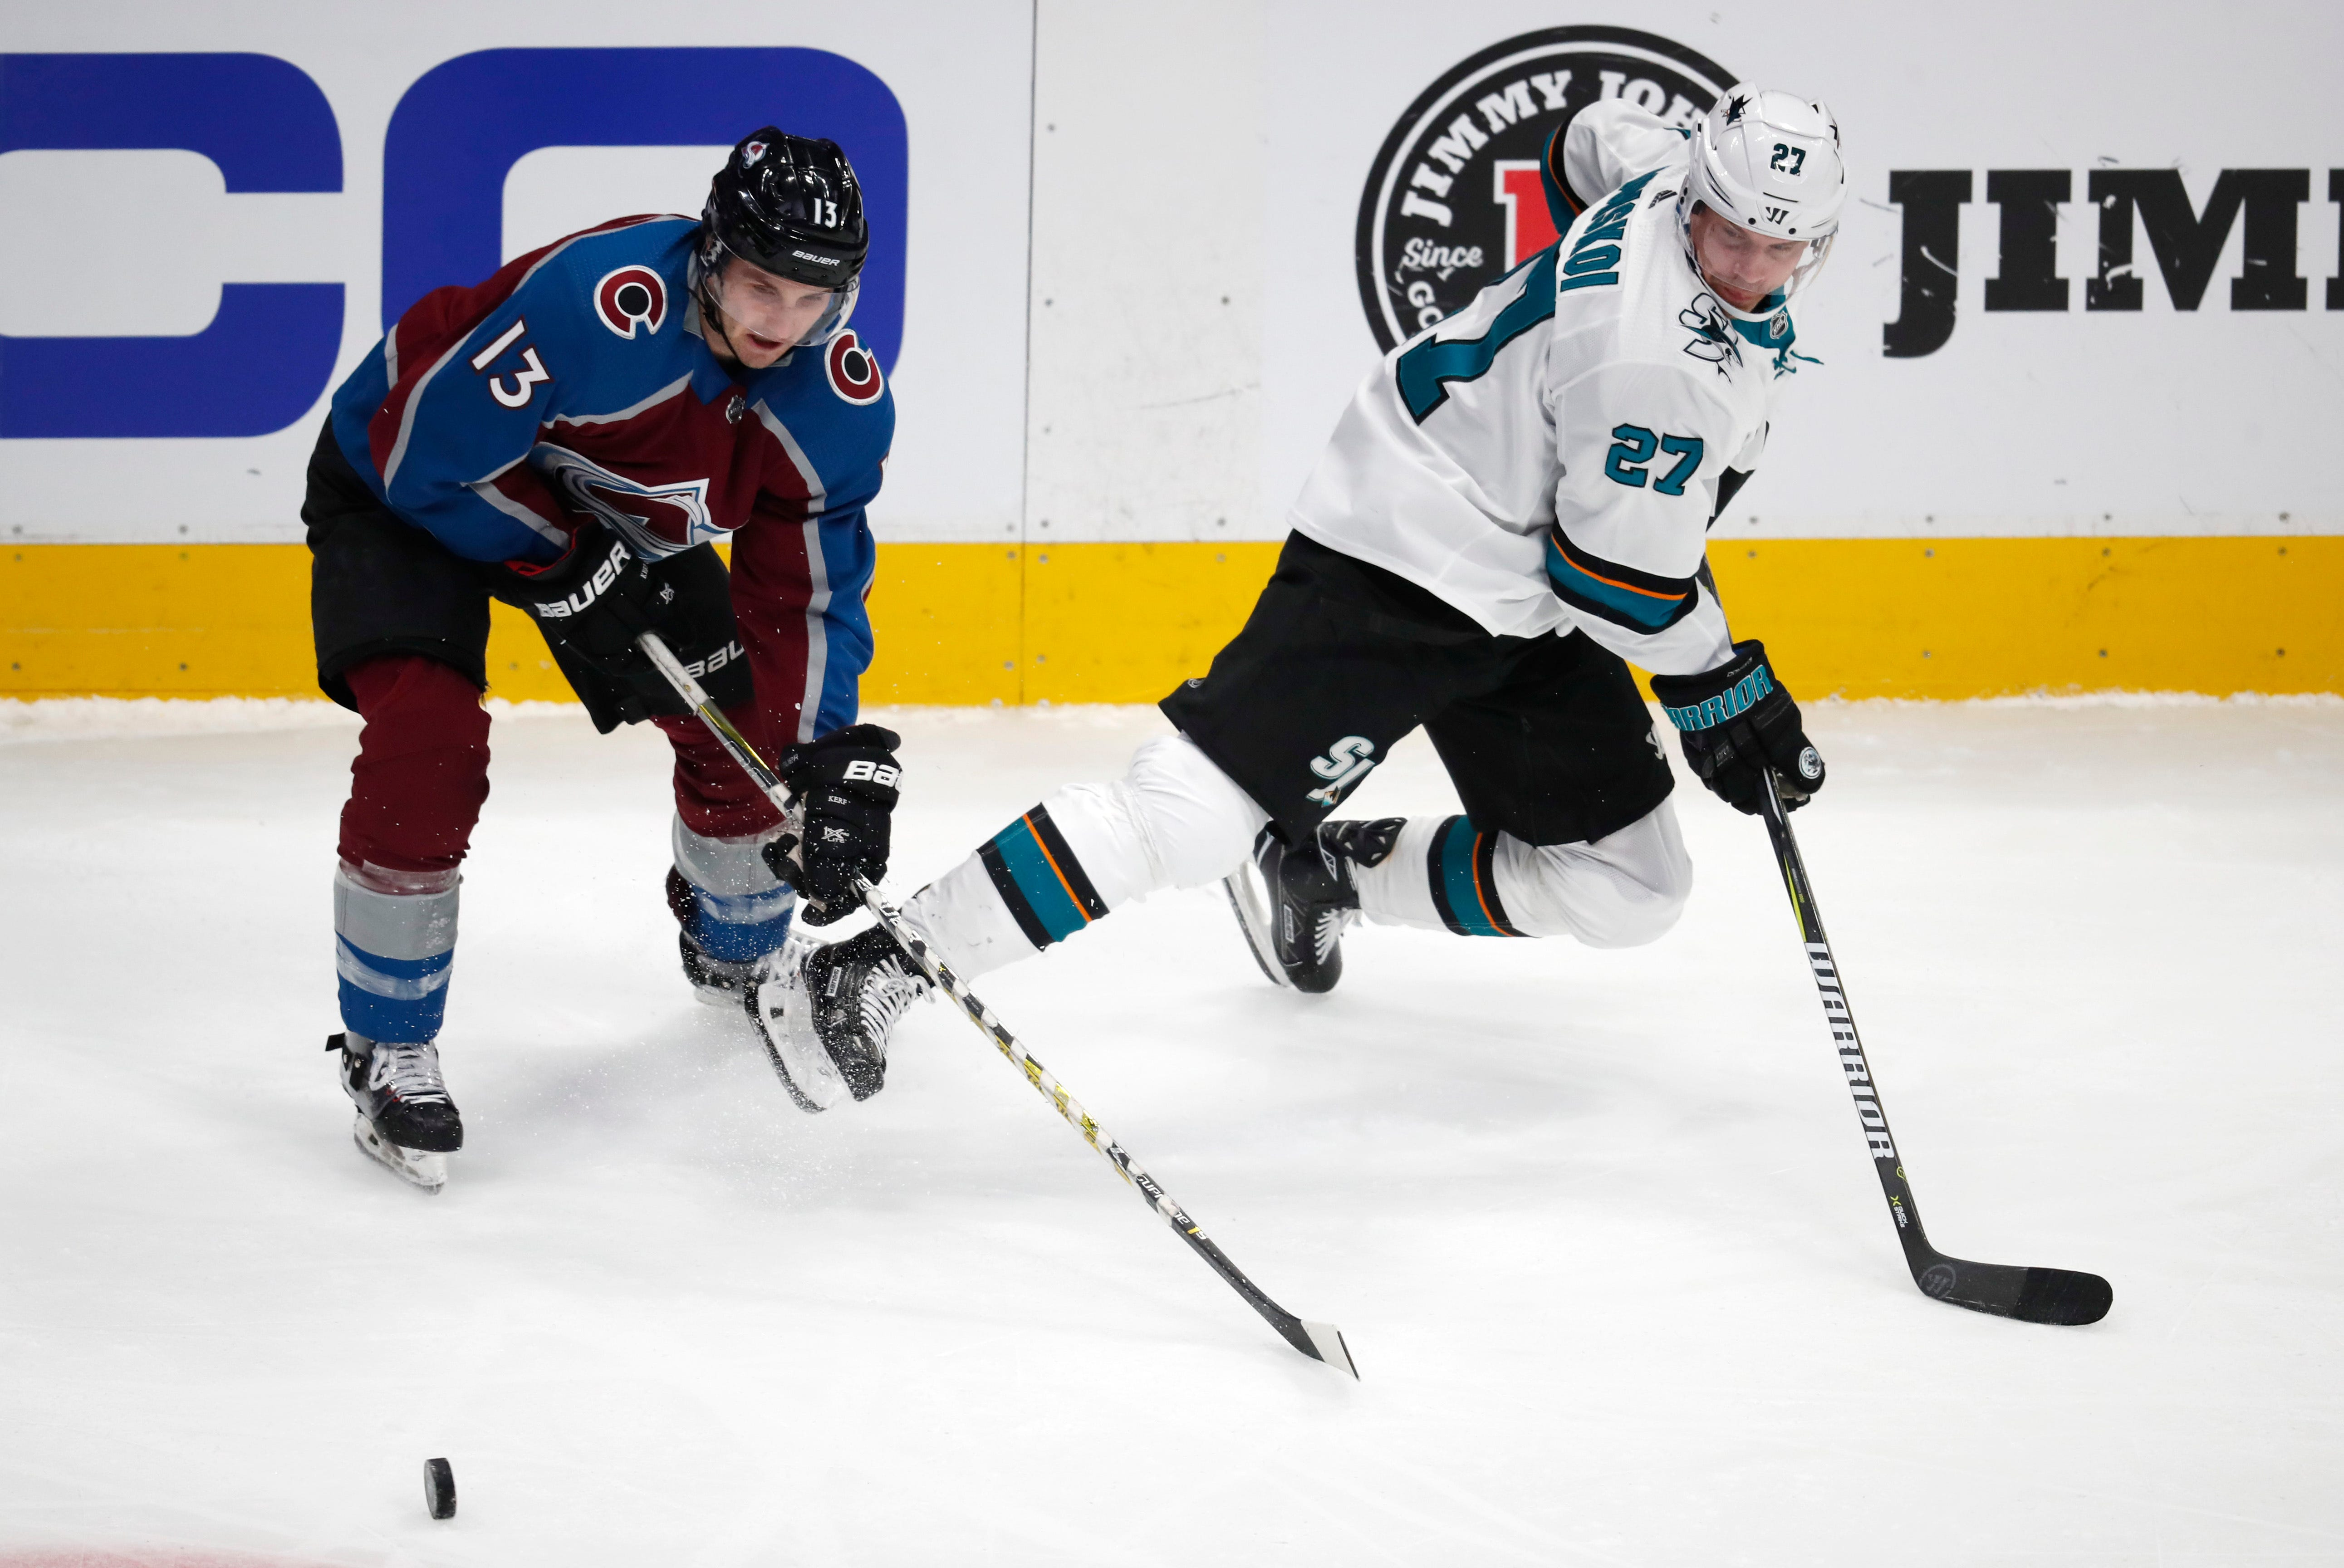 Pavelski, Burns get 4 points each as Sharks beat Avs 5-4